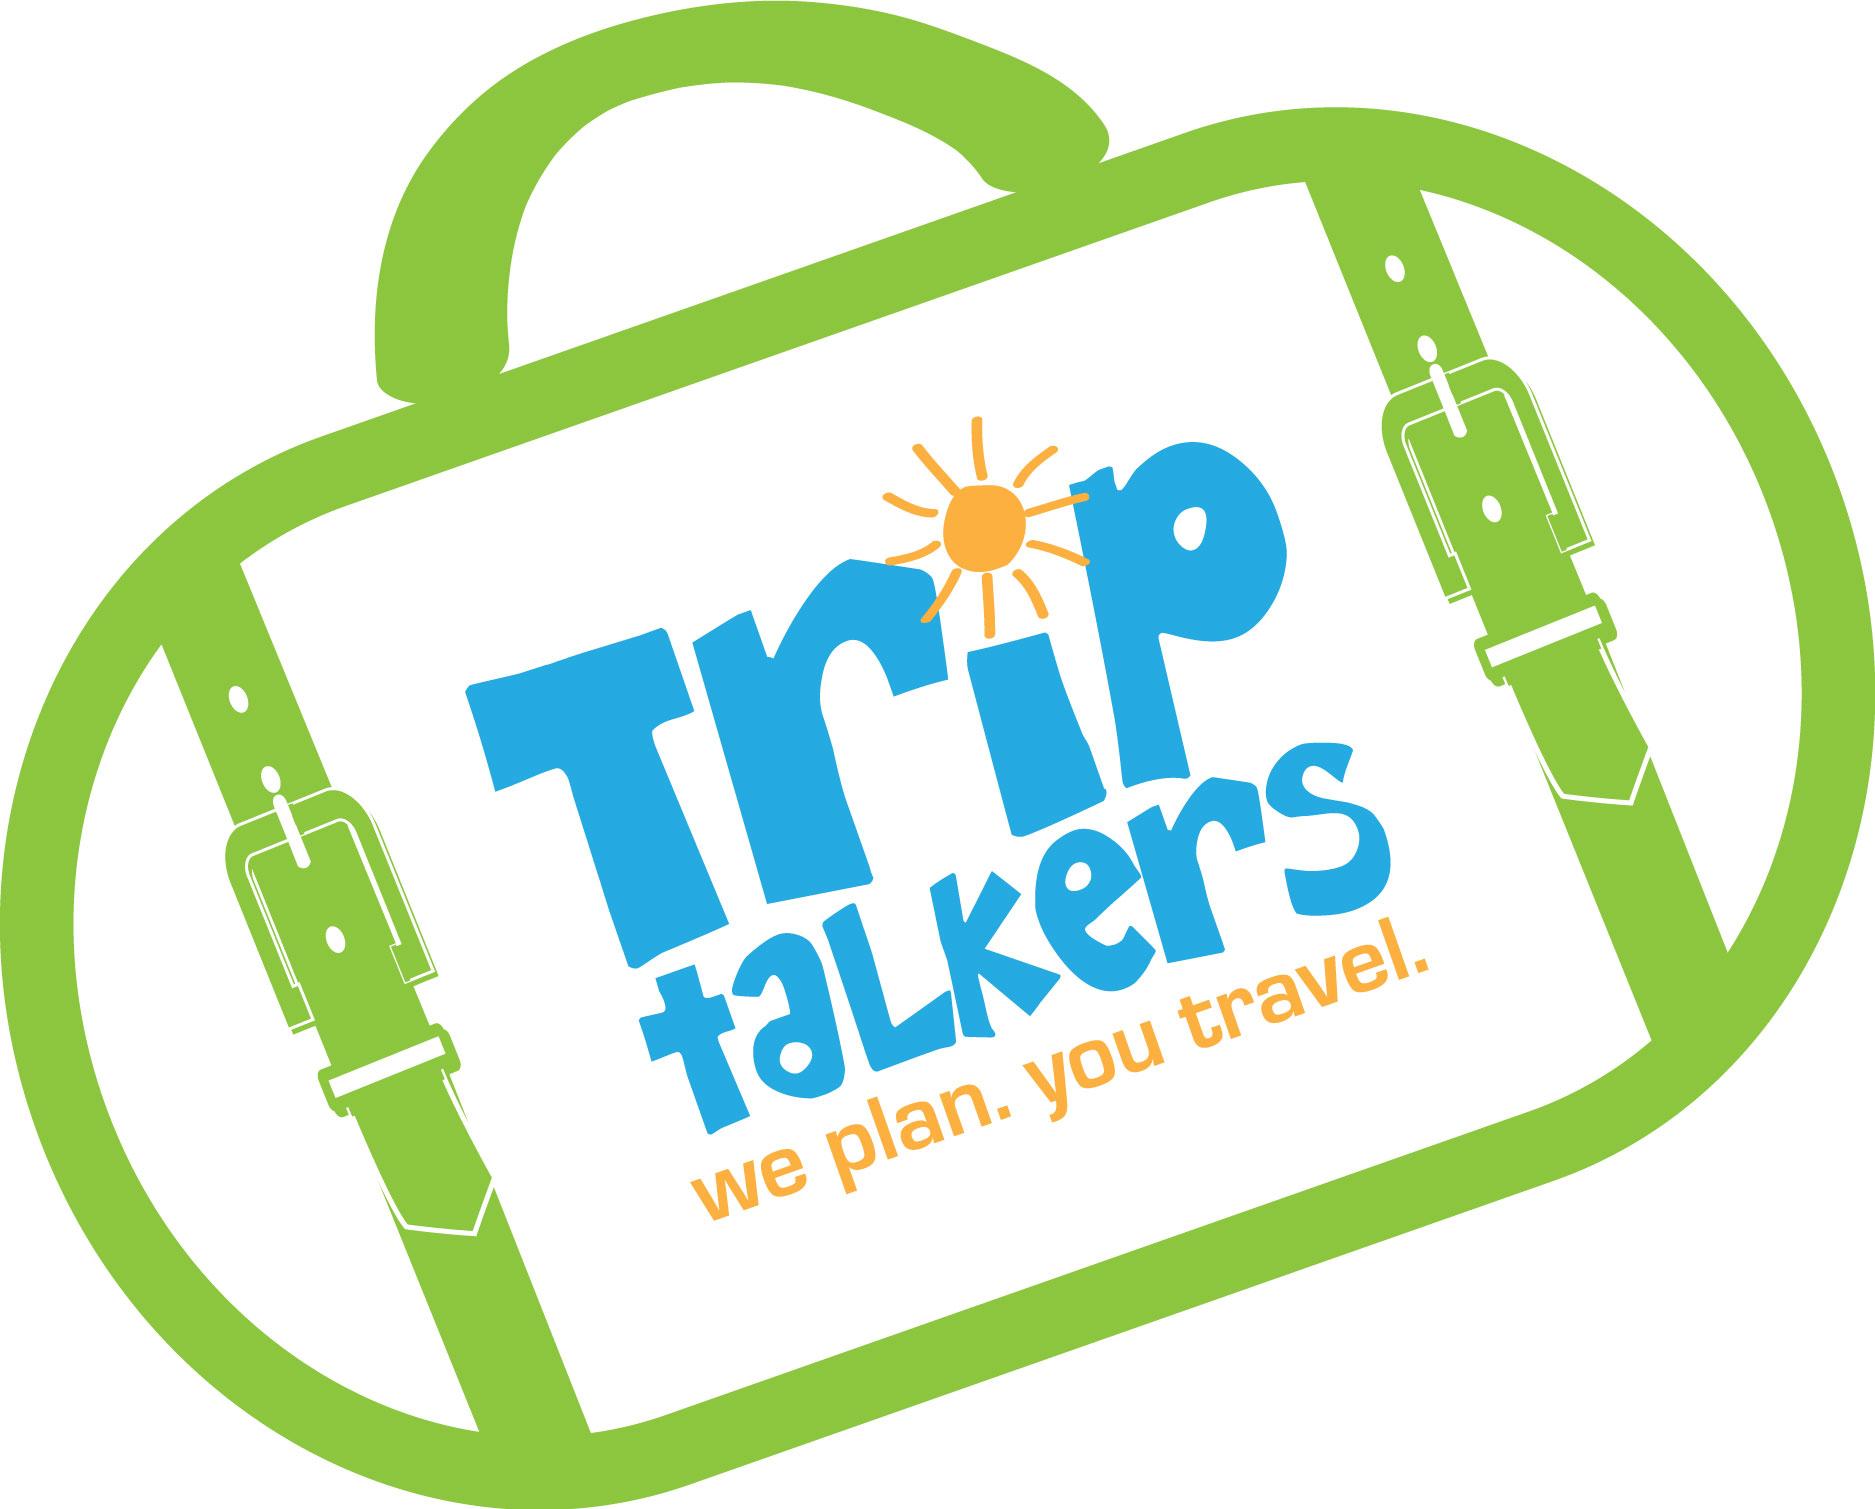 Trip talkers